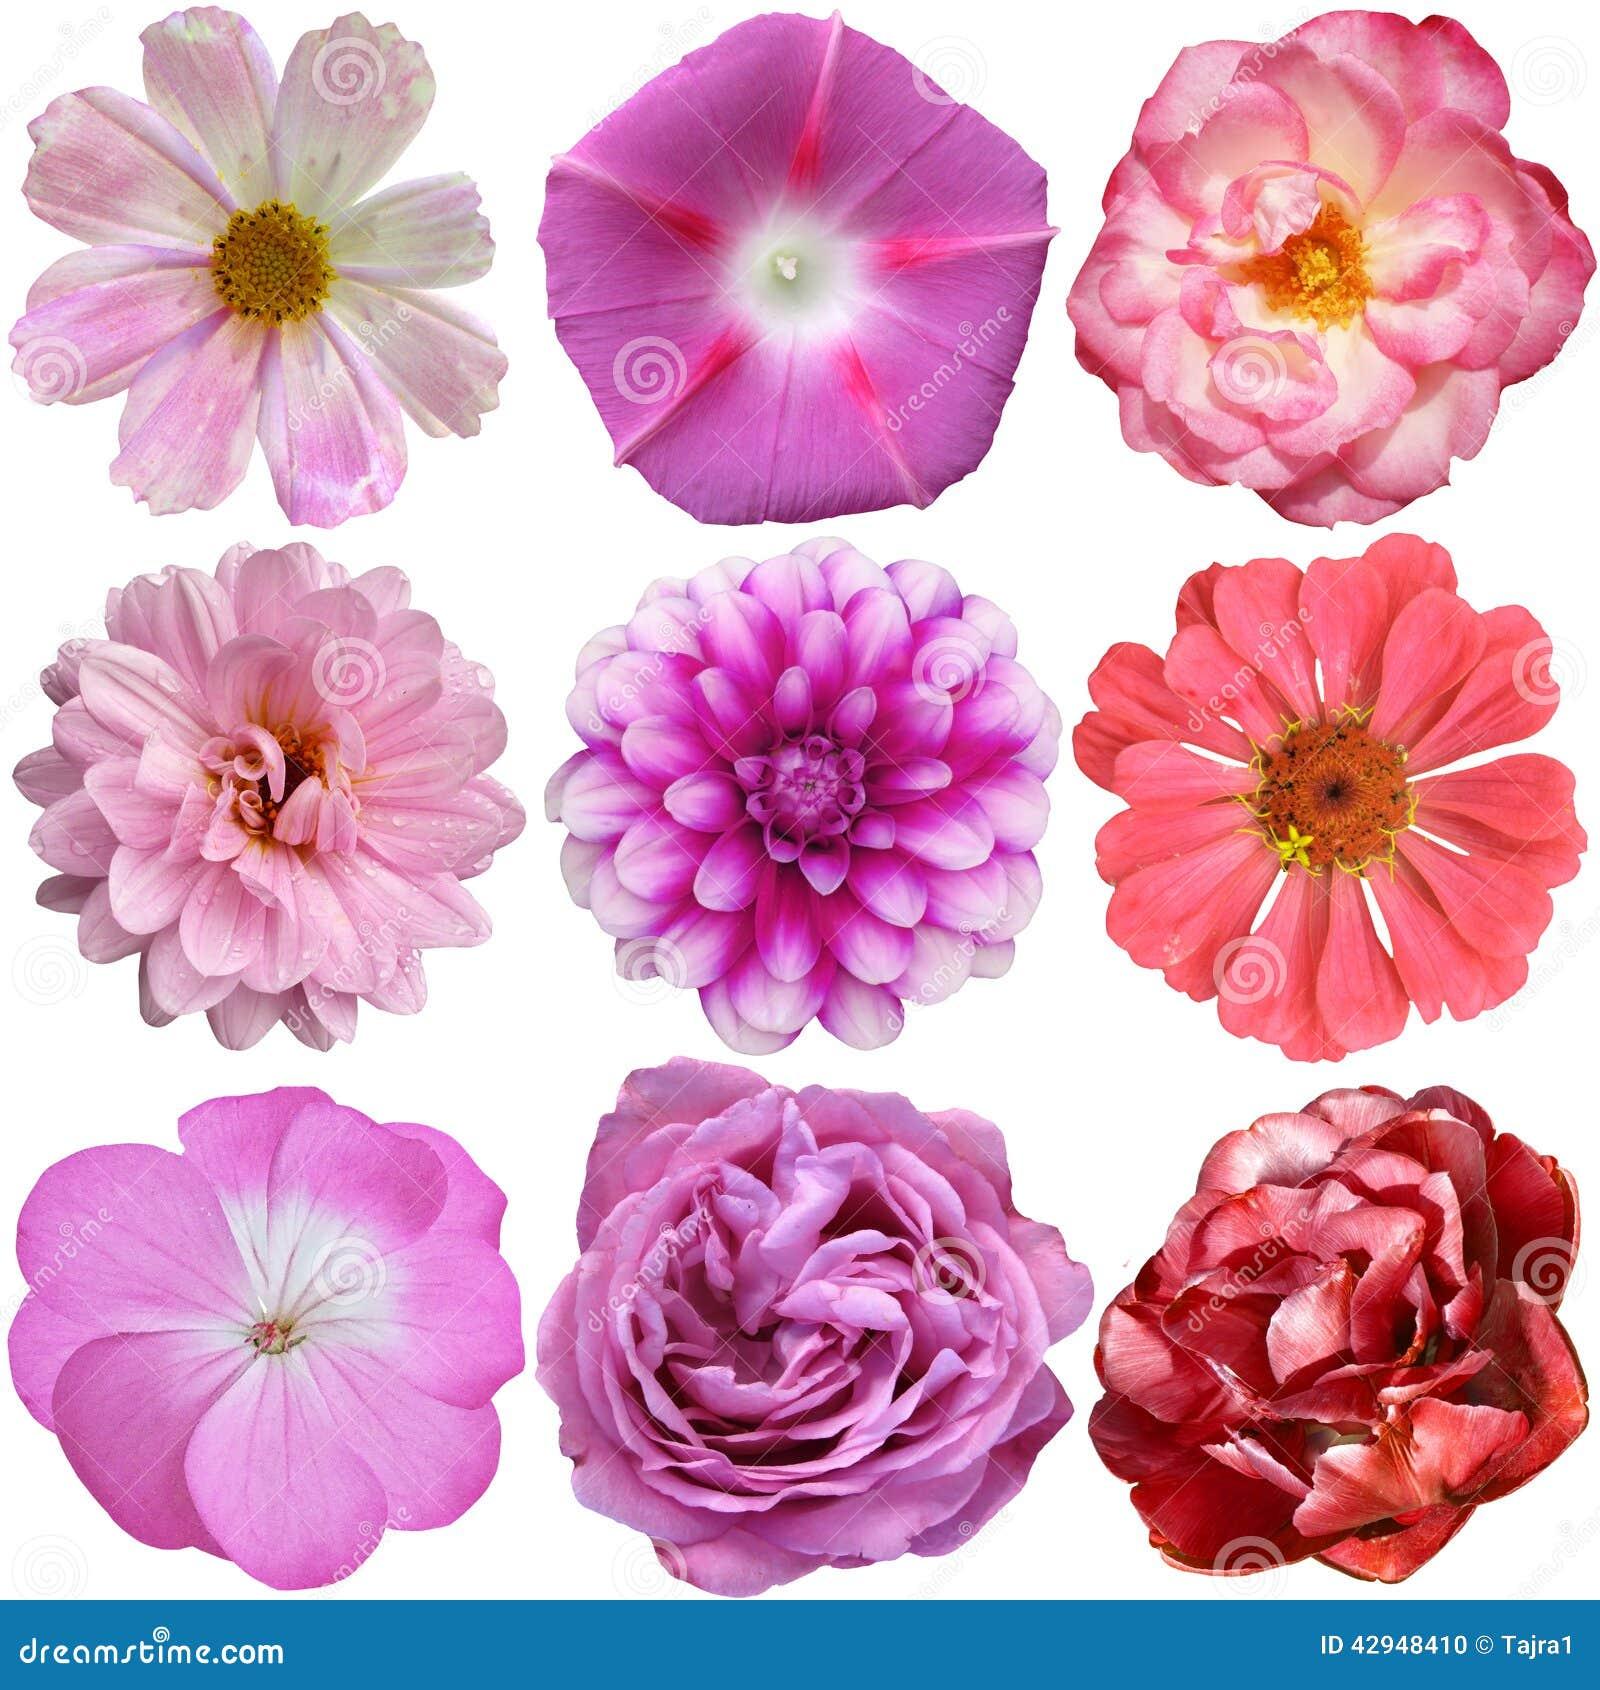 Photos of various flowers 50 Amazing Flower Photographs - ProFlowers Blog